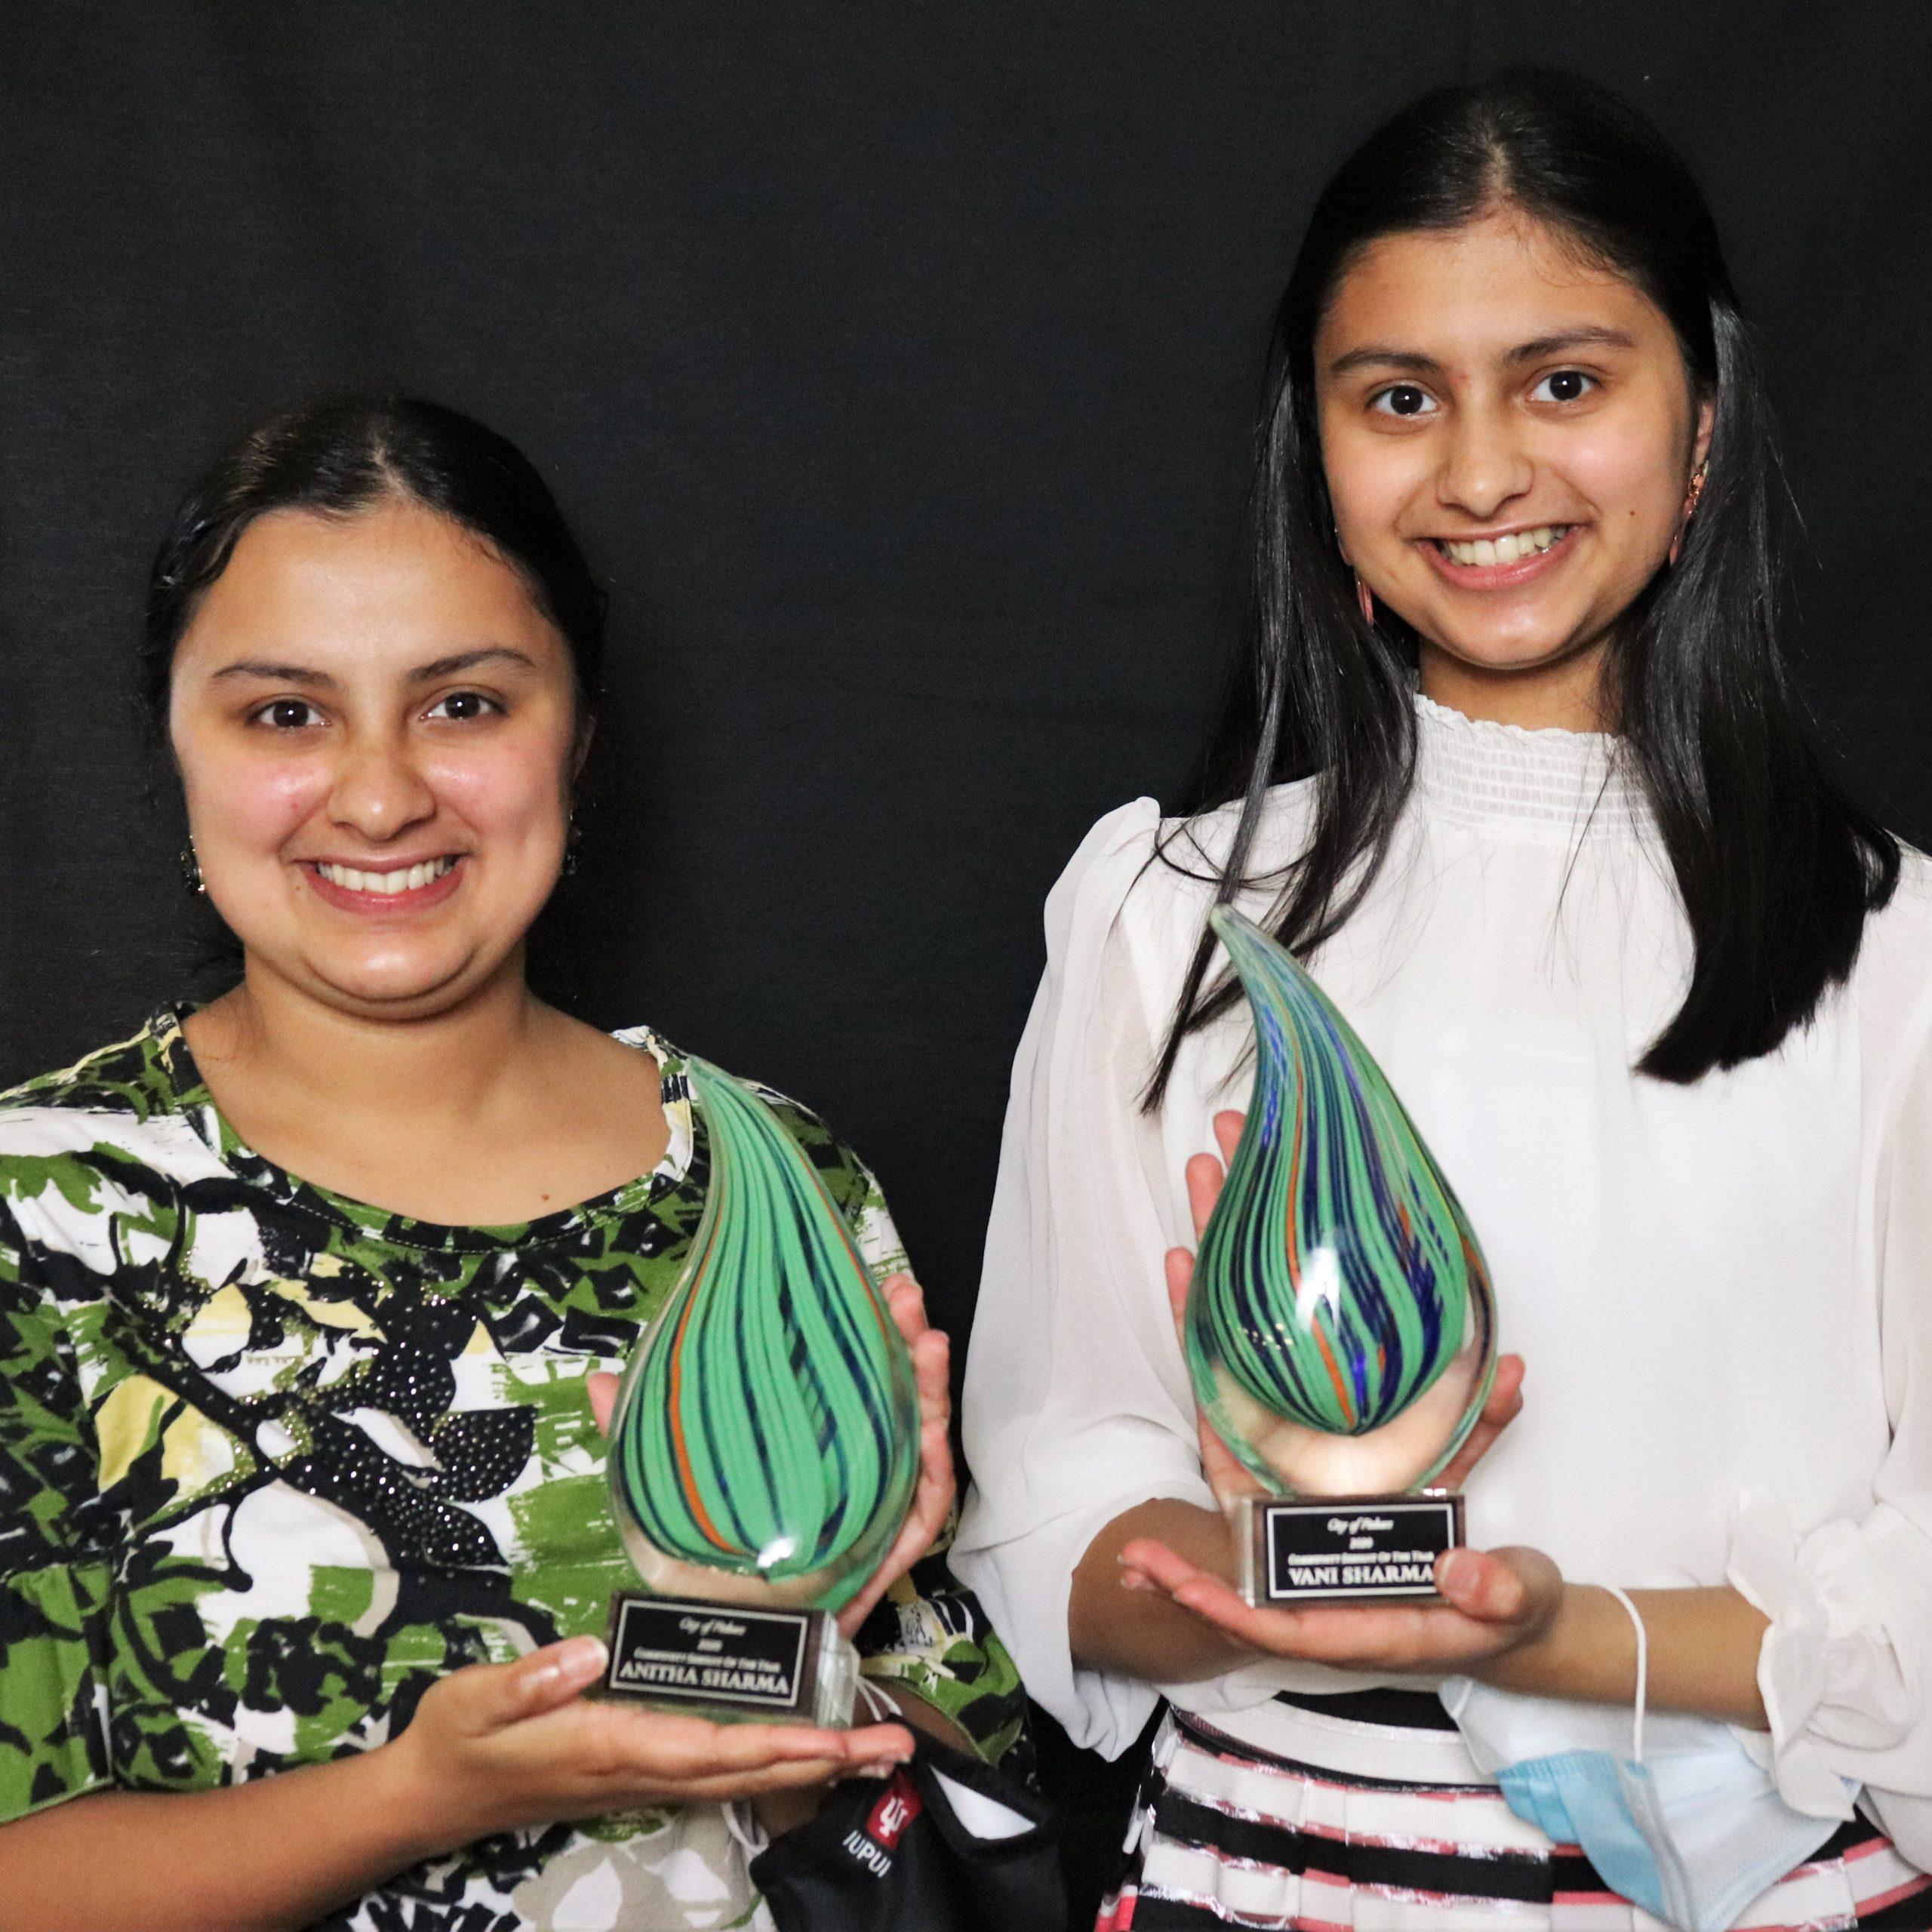 Anitha and Vani